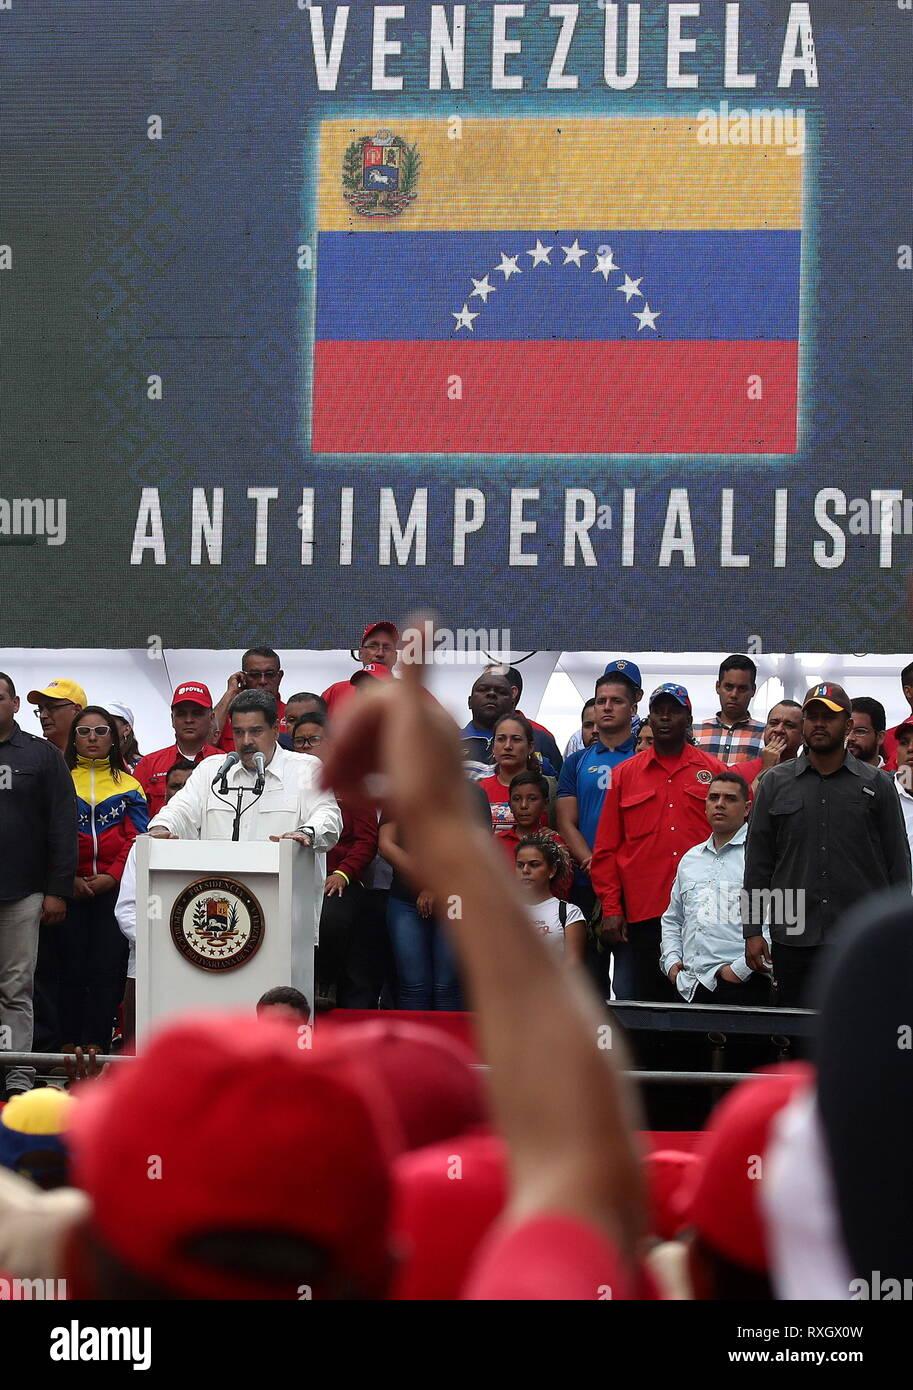 Caracas, Venezuela. 09th Mar, 2019. CARACAS, VENEZUELA - MARCH 10, 2019: Venezuela's President Nicolas Maduro speaks during a rally marking Anti-imperialism Day by the Miraflores Palace. Valery Sharifulin/TASS Credit: ITAR-TASS News Agency/Alamy Live News - Stock Image